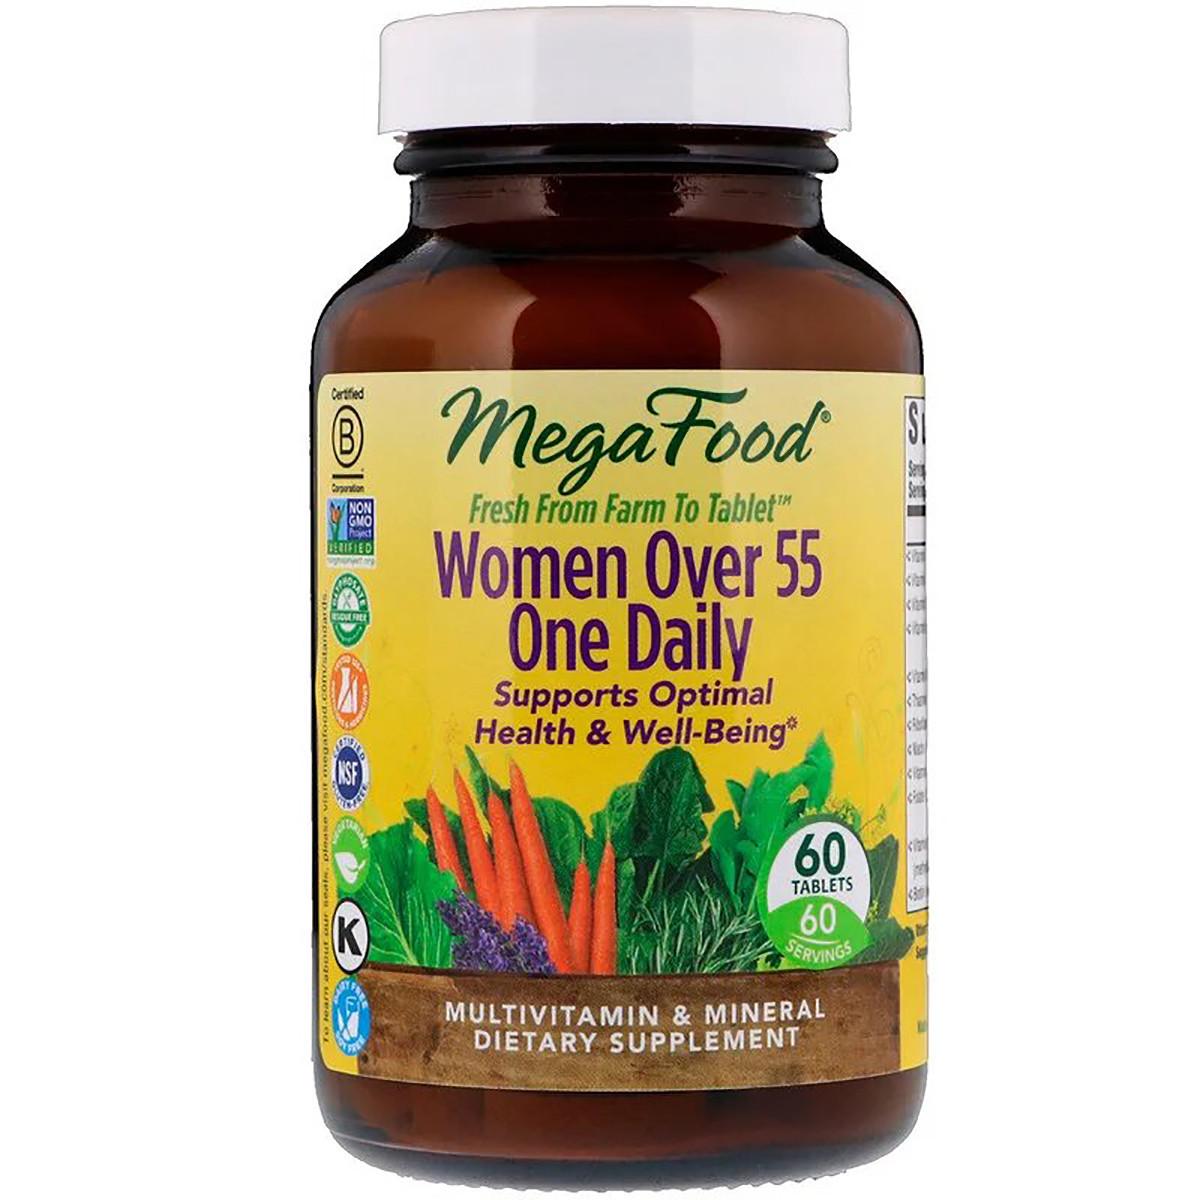 Мультивитамины для женщин 55+, Women Over 55 One Daily, MegaFood, 60 таблеток